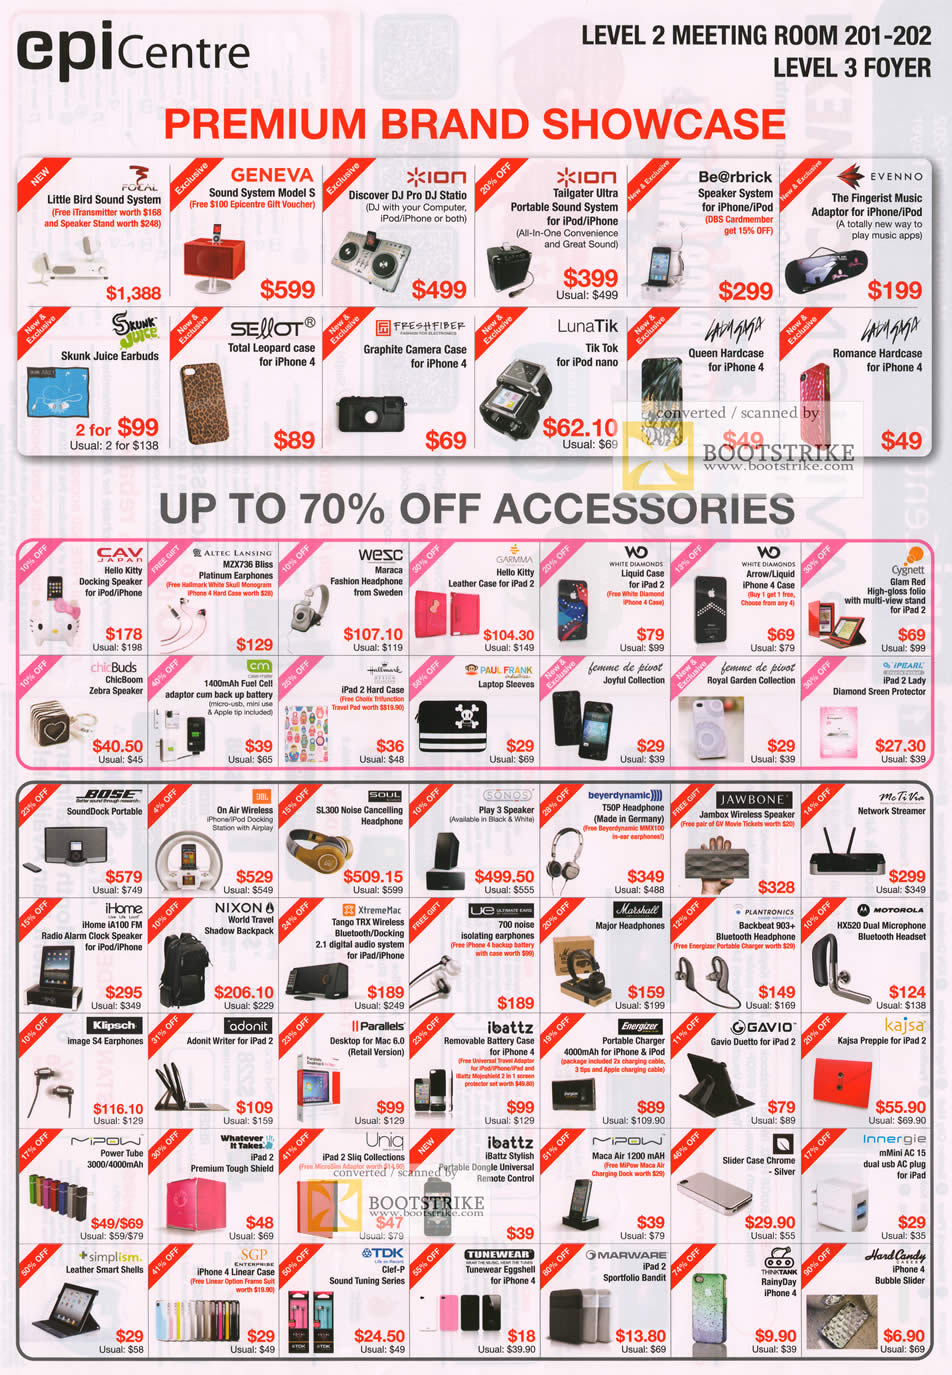 COMEX 2011 price list image brochure of EpiCentre Accessories Geneva Ion Evenno Skunk Juice CAV Japan Altec Lansing Bose TDK Uniq MGavio IBattz Klipsch Jawbone Sonos